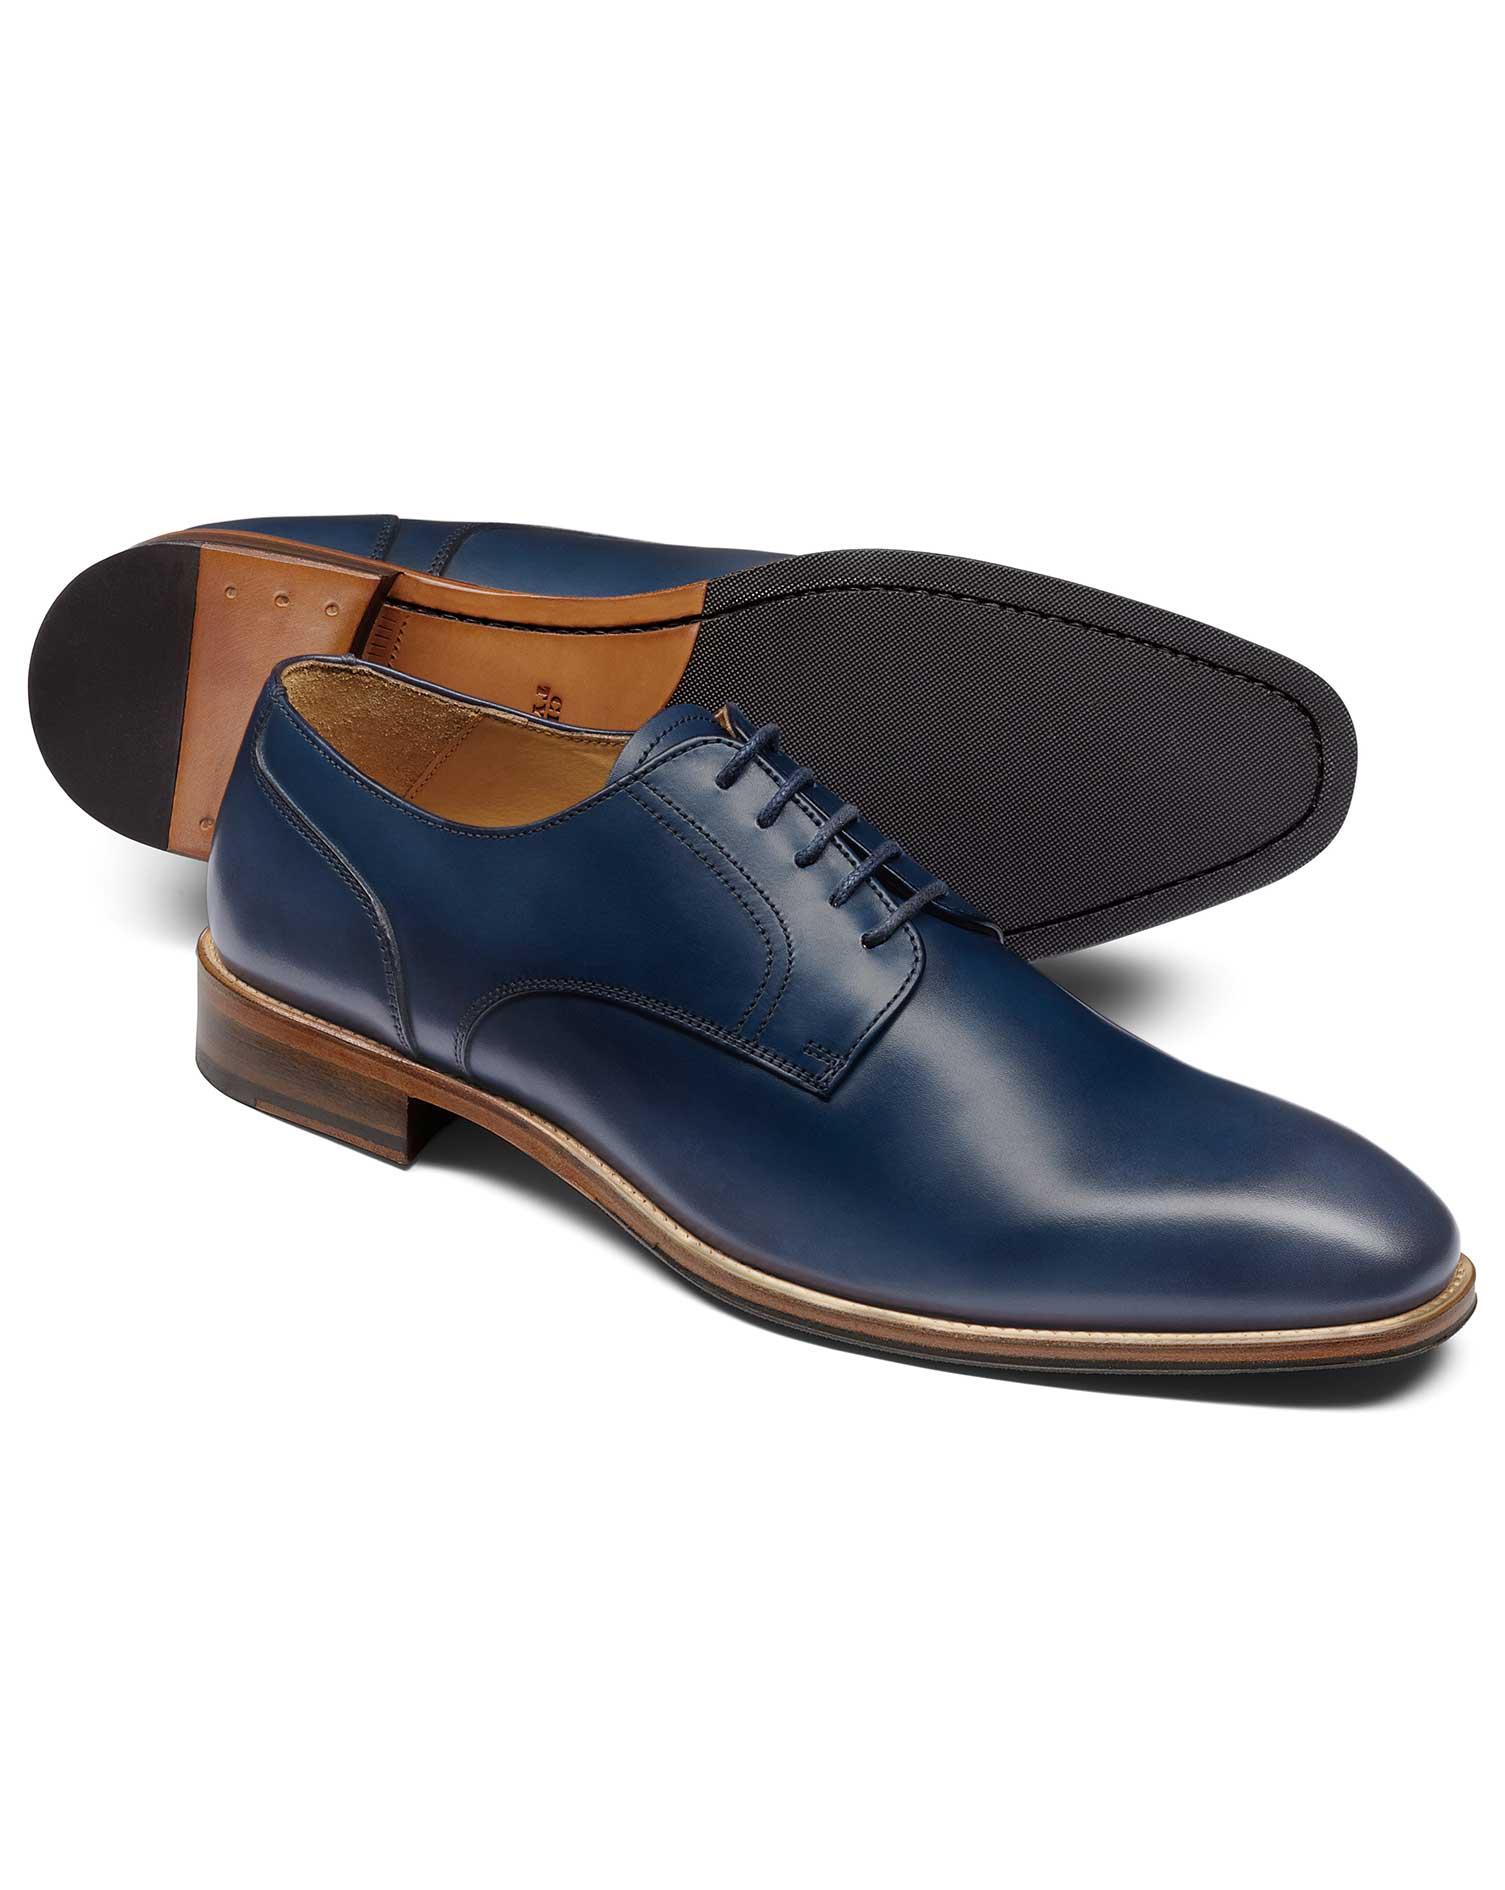 Navy Derby Shoe Size 13 R by Charles Tyrwhitt